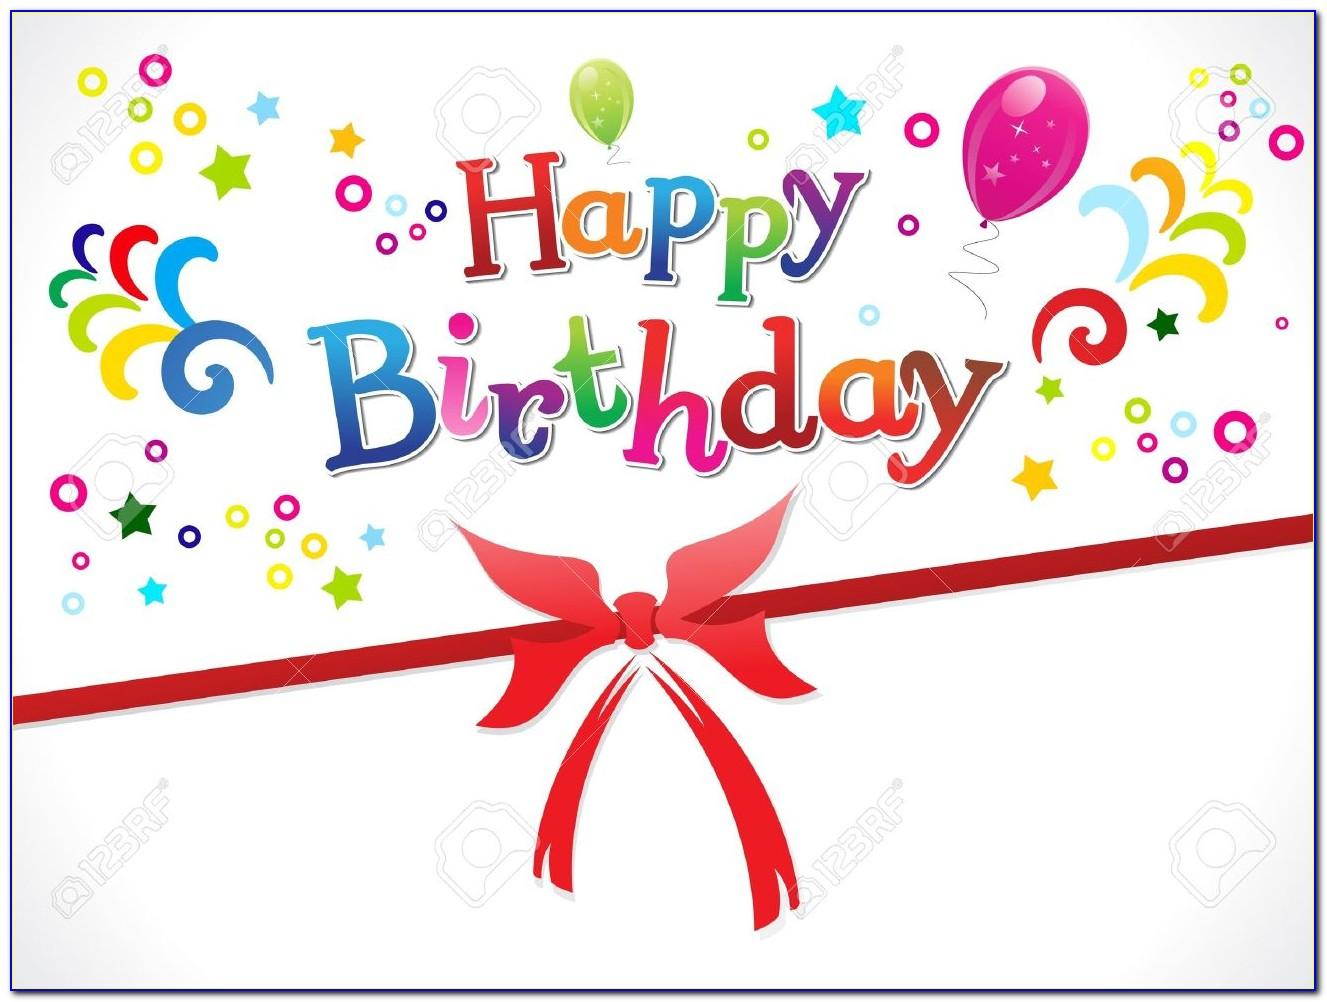 Free Birthday Card Template Photoshop